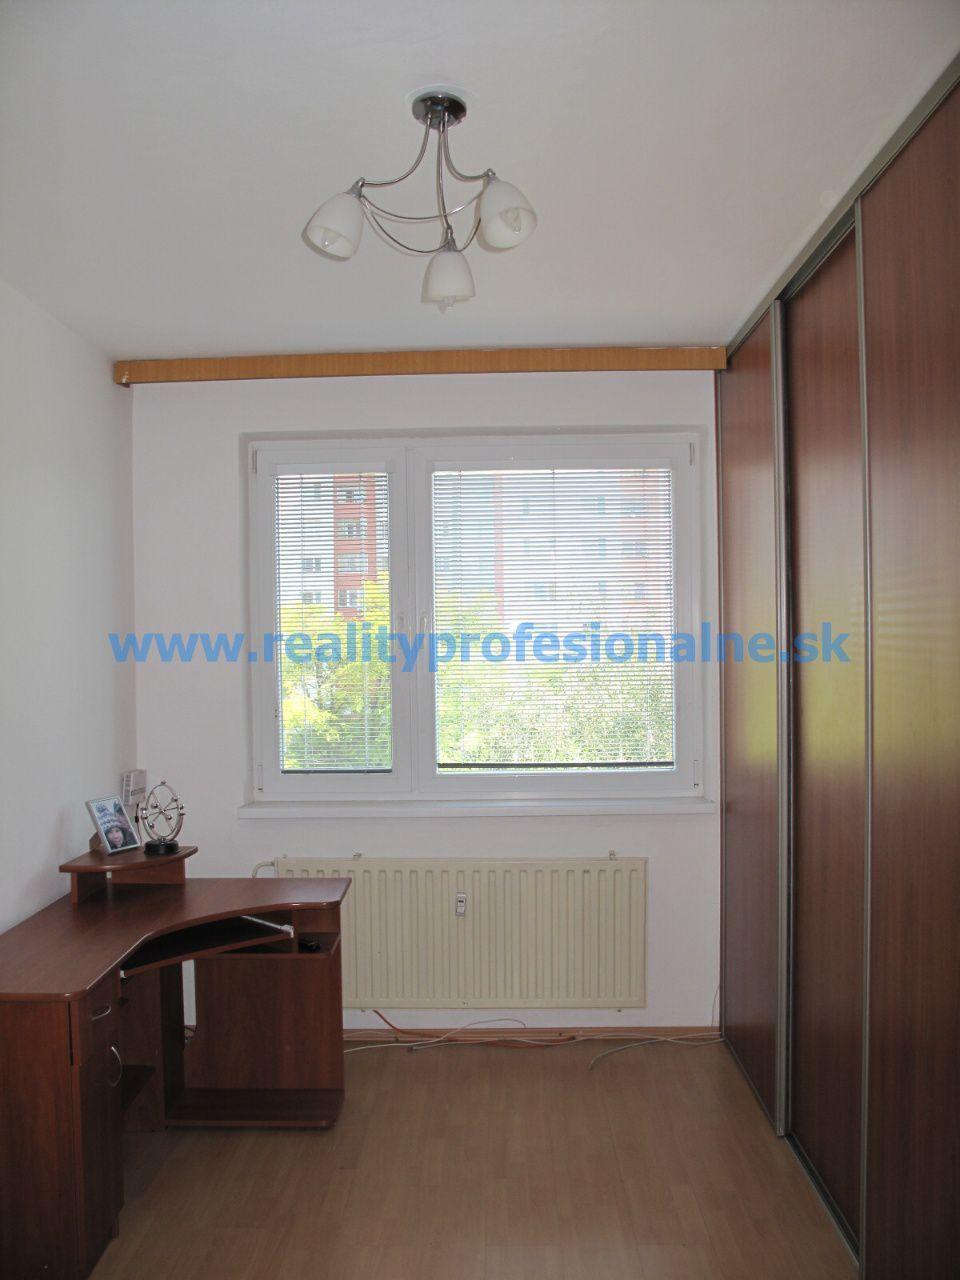 PREDANÉ ZA 34 DNI: 3 izbový byt, Bratislava - Petržalka, predaj bytu v dobrej lokalite